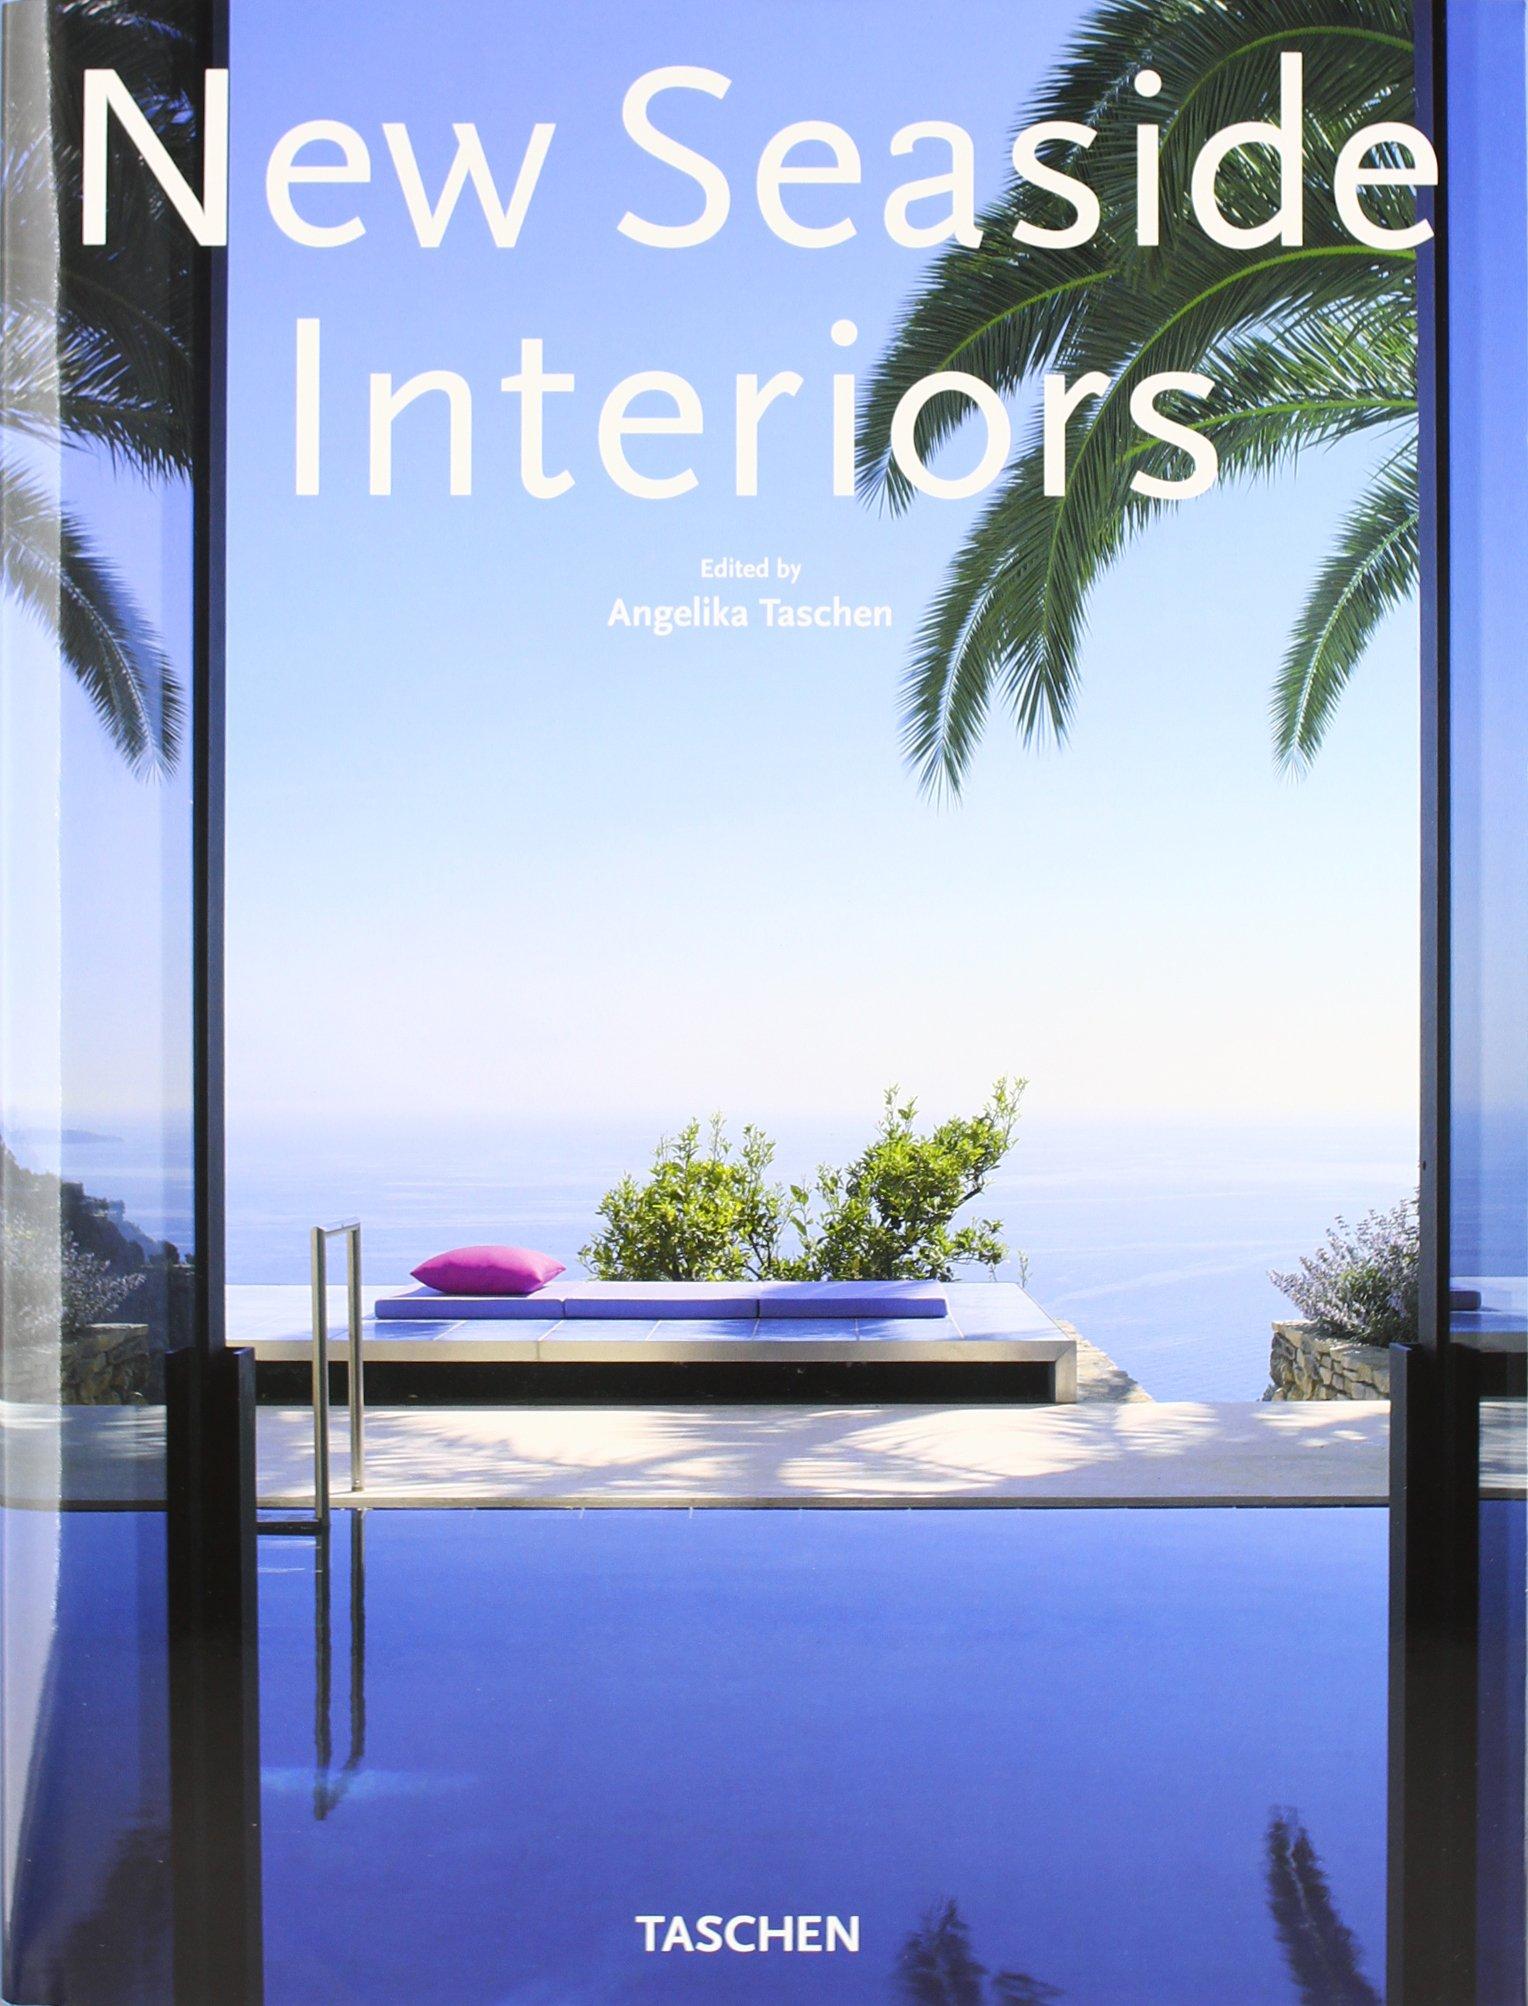 new seaside interiors